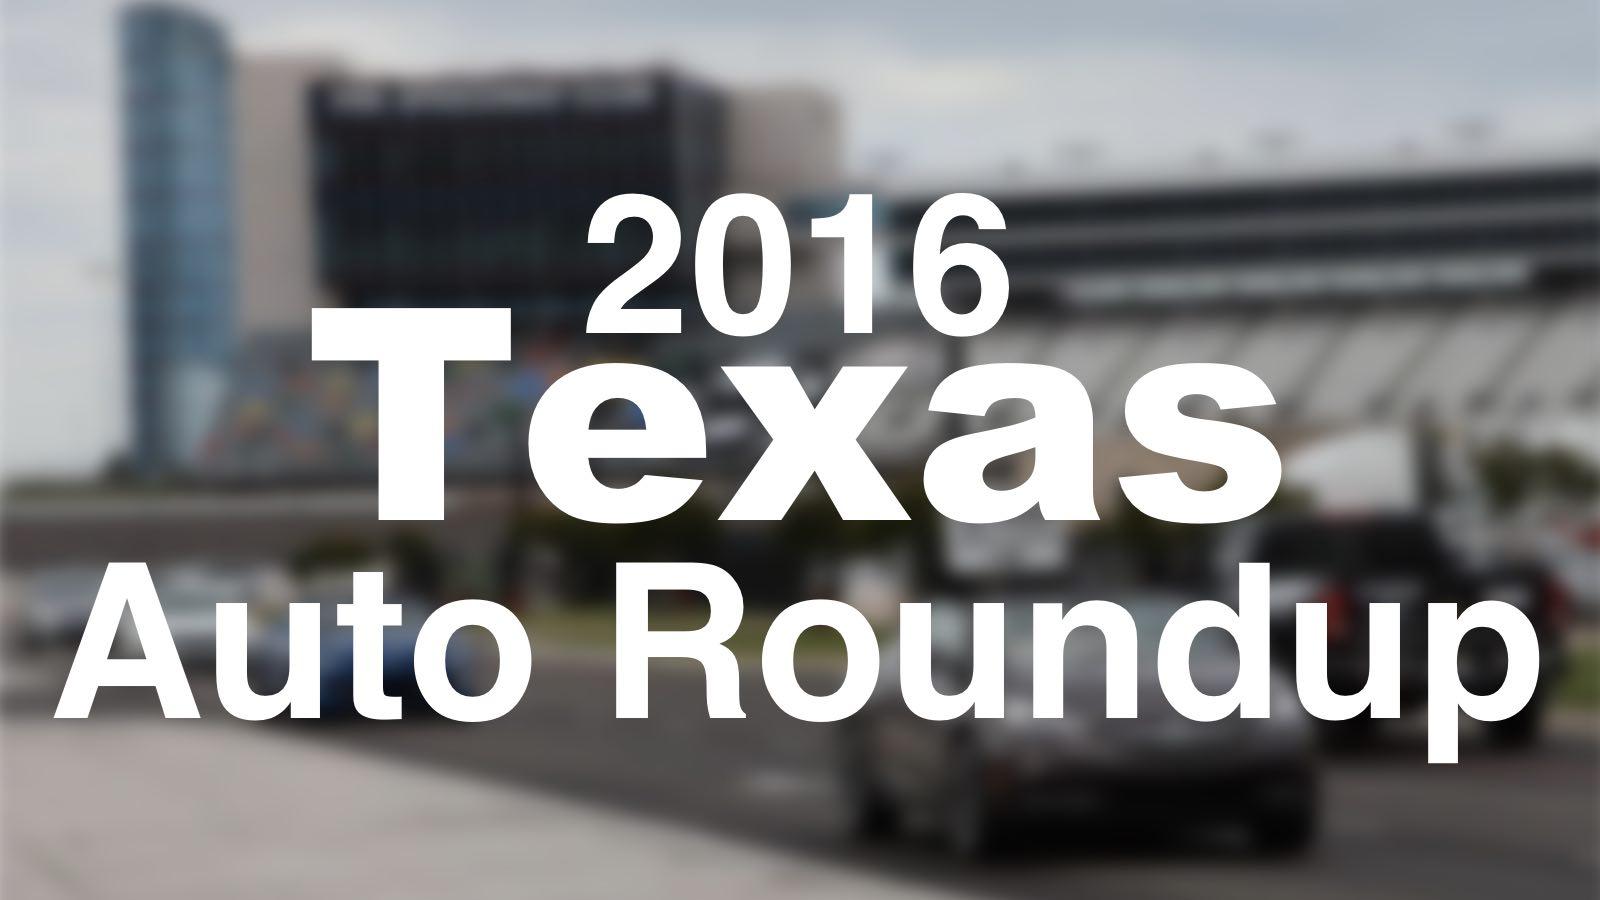 The 2016 Texas Auto Roupdup